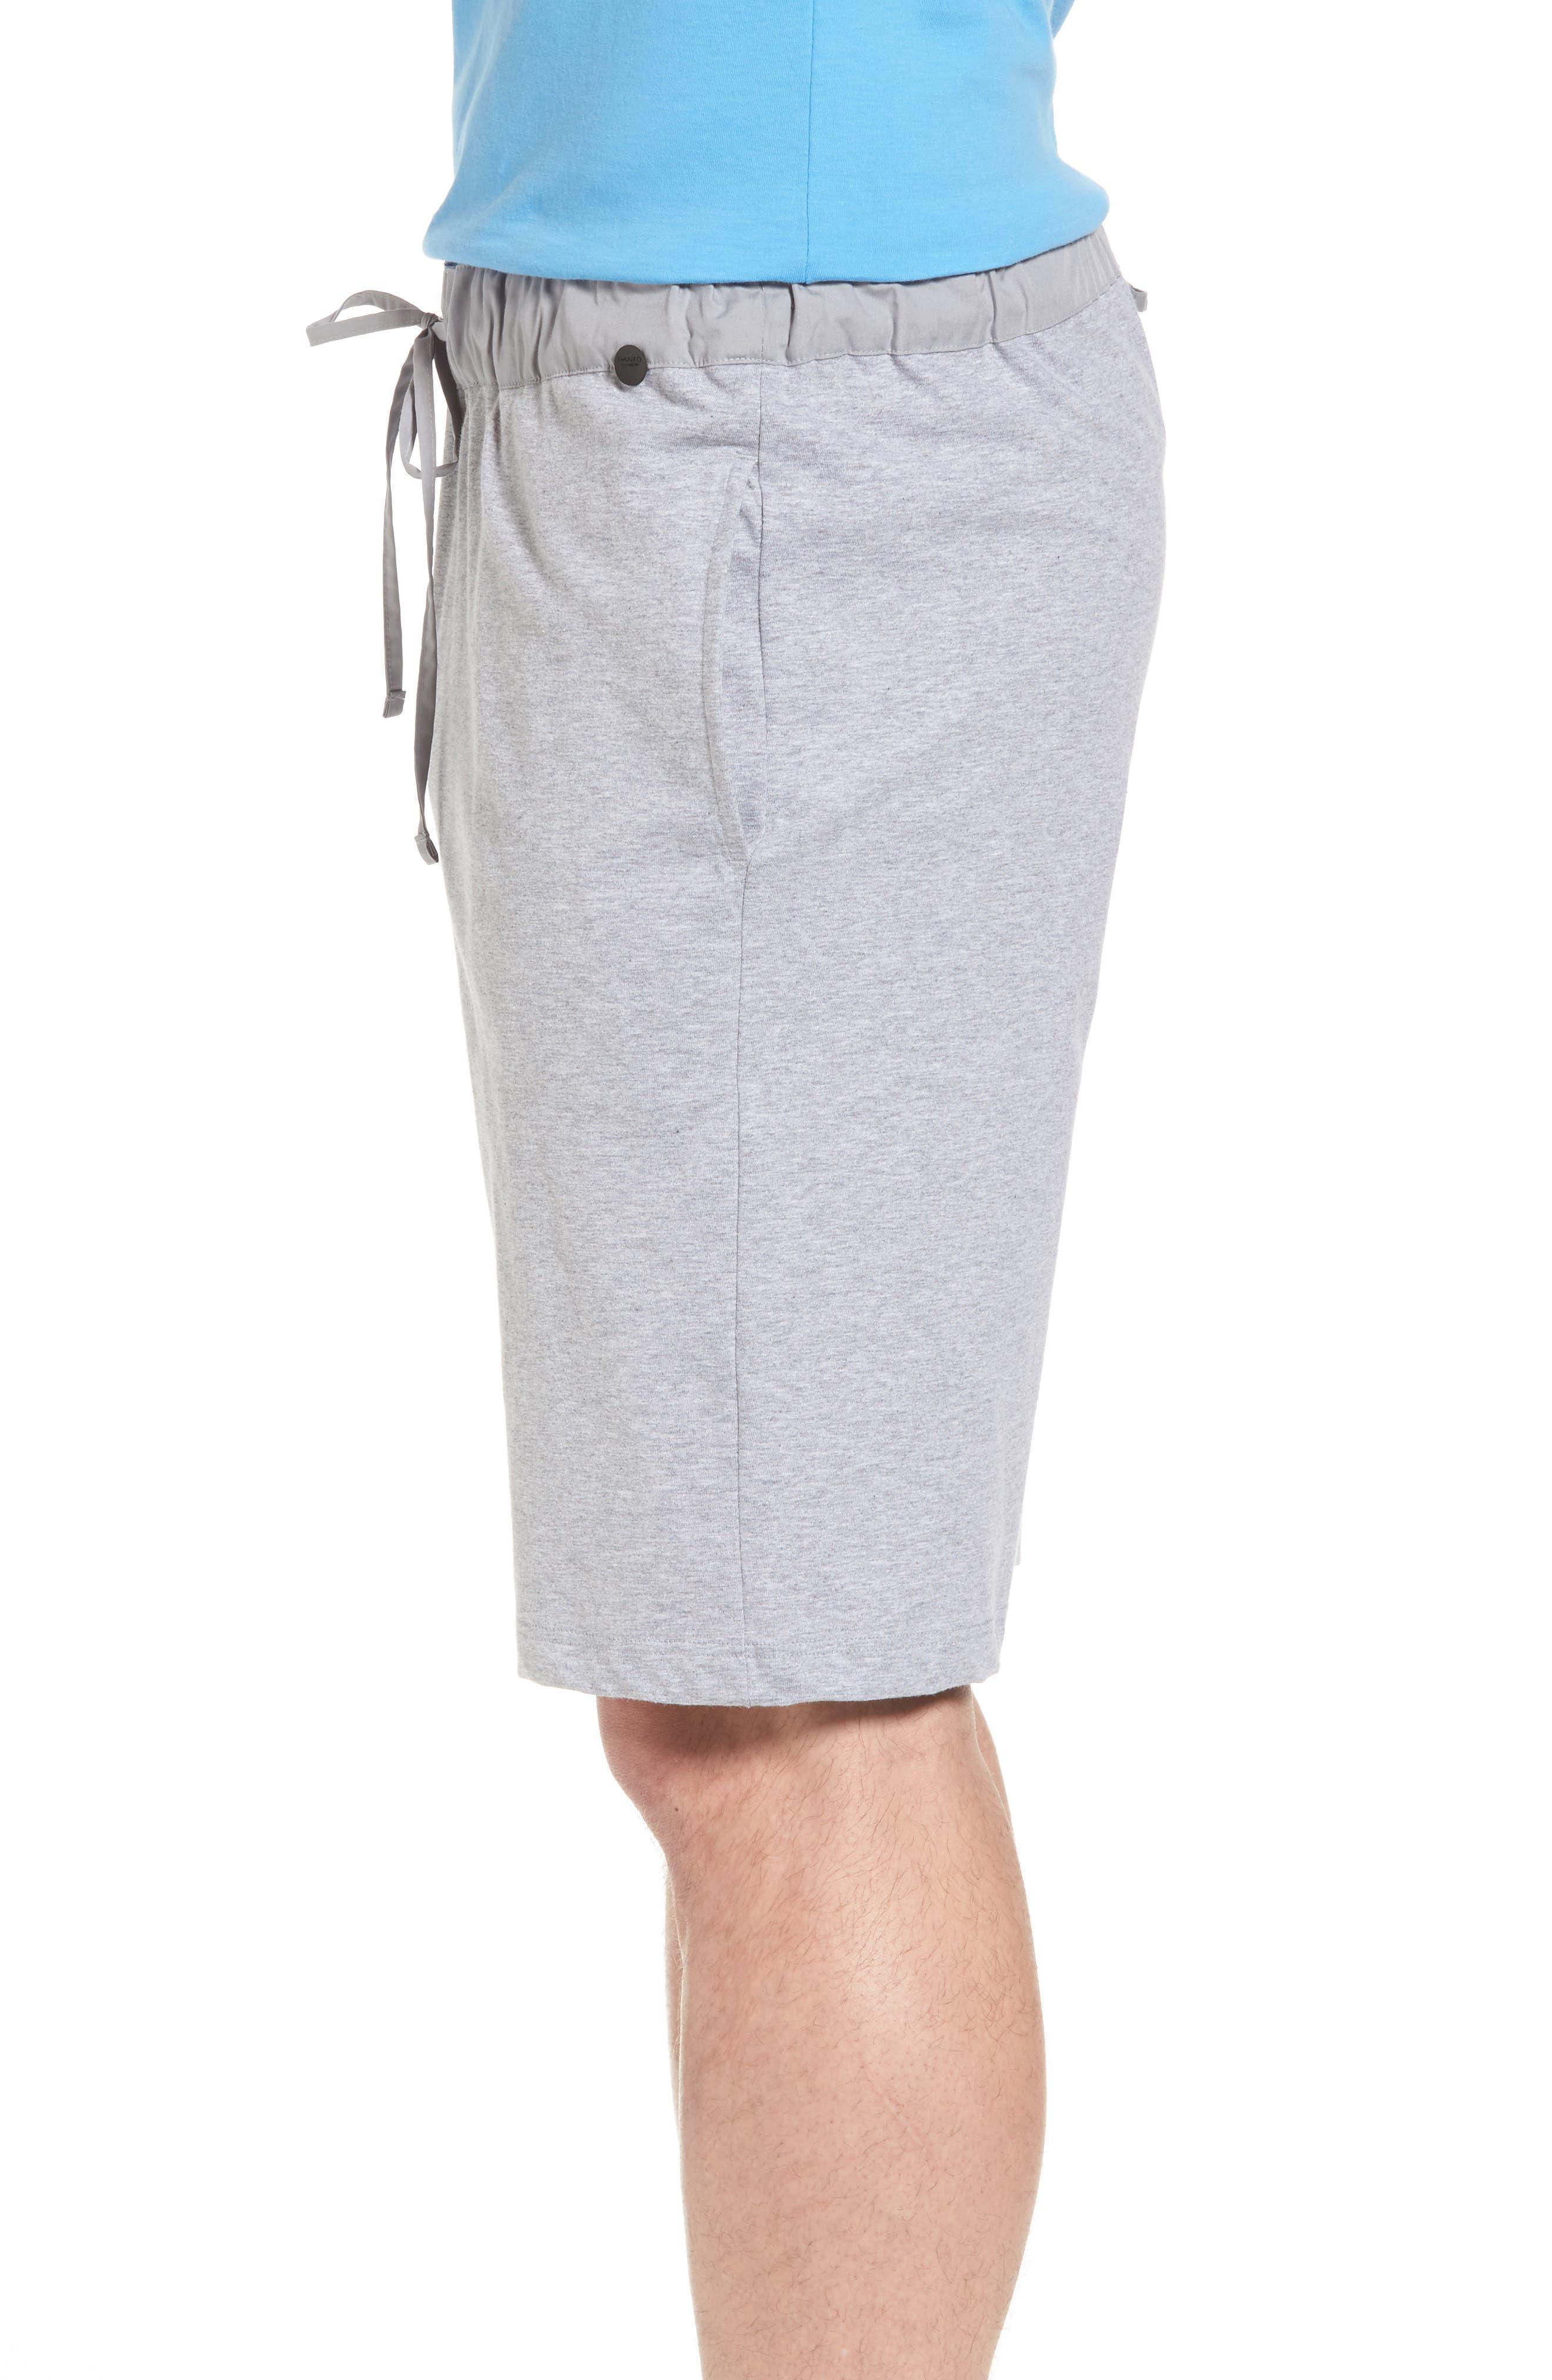 Night & Day Knit Shorts,                             Alternate thumbnail 3, color,                             SILVER MELANGE